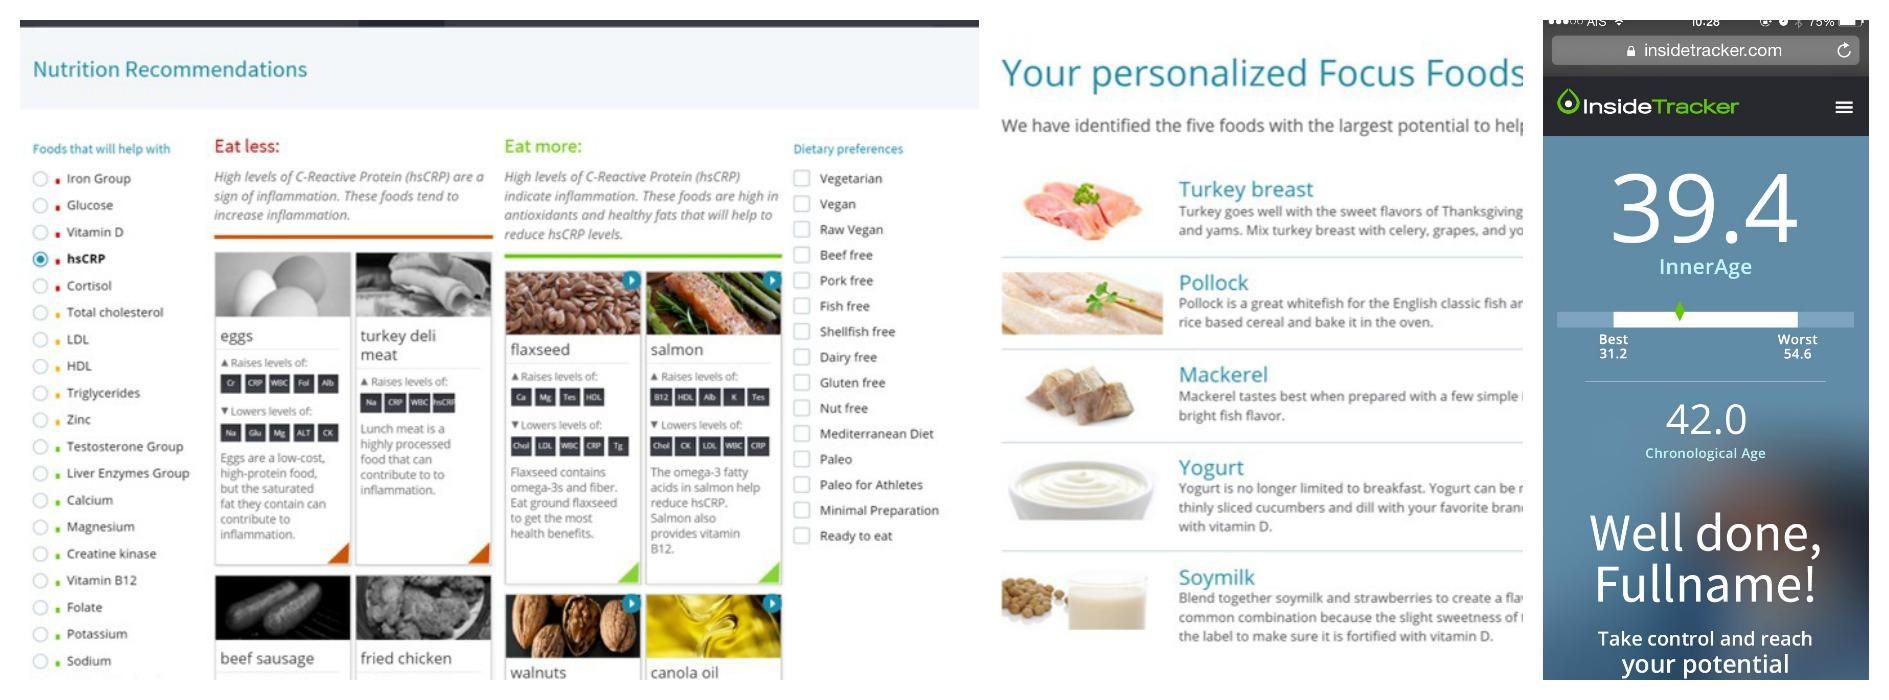 screenshots of InsideTracker and InnerAge. Photos provided.